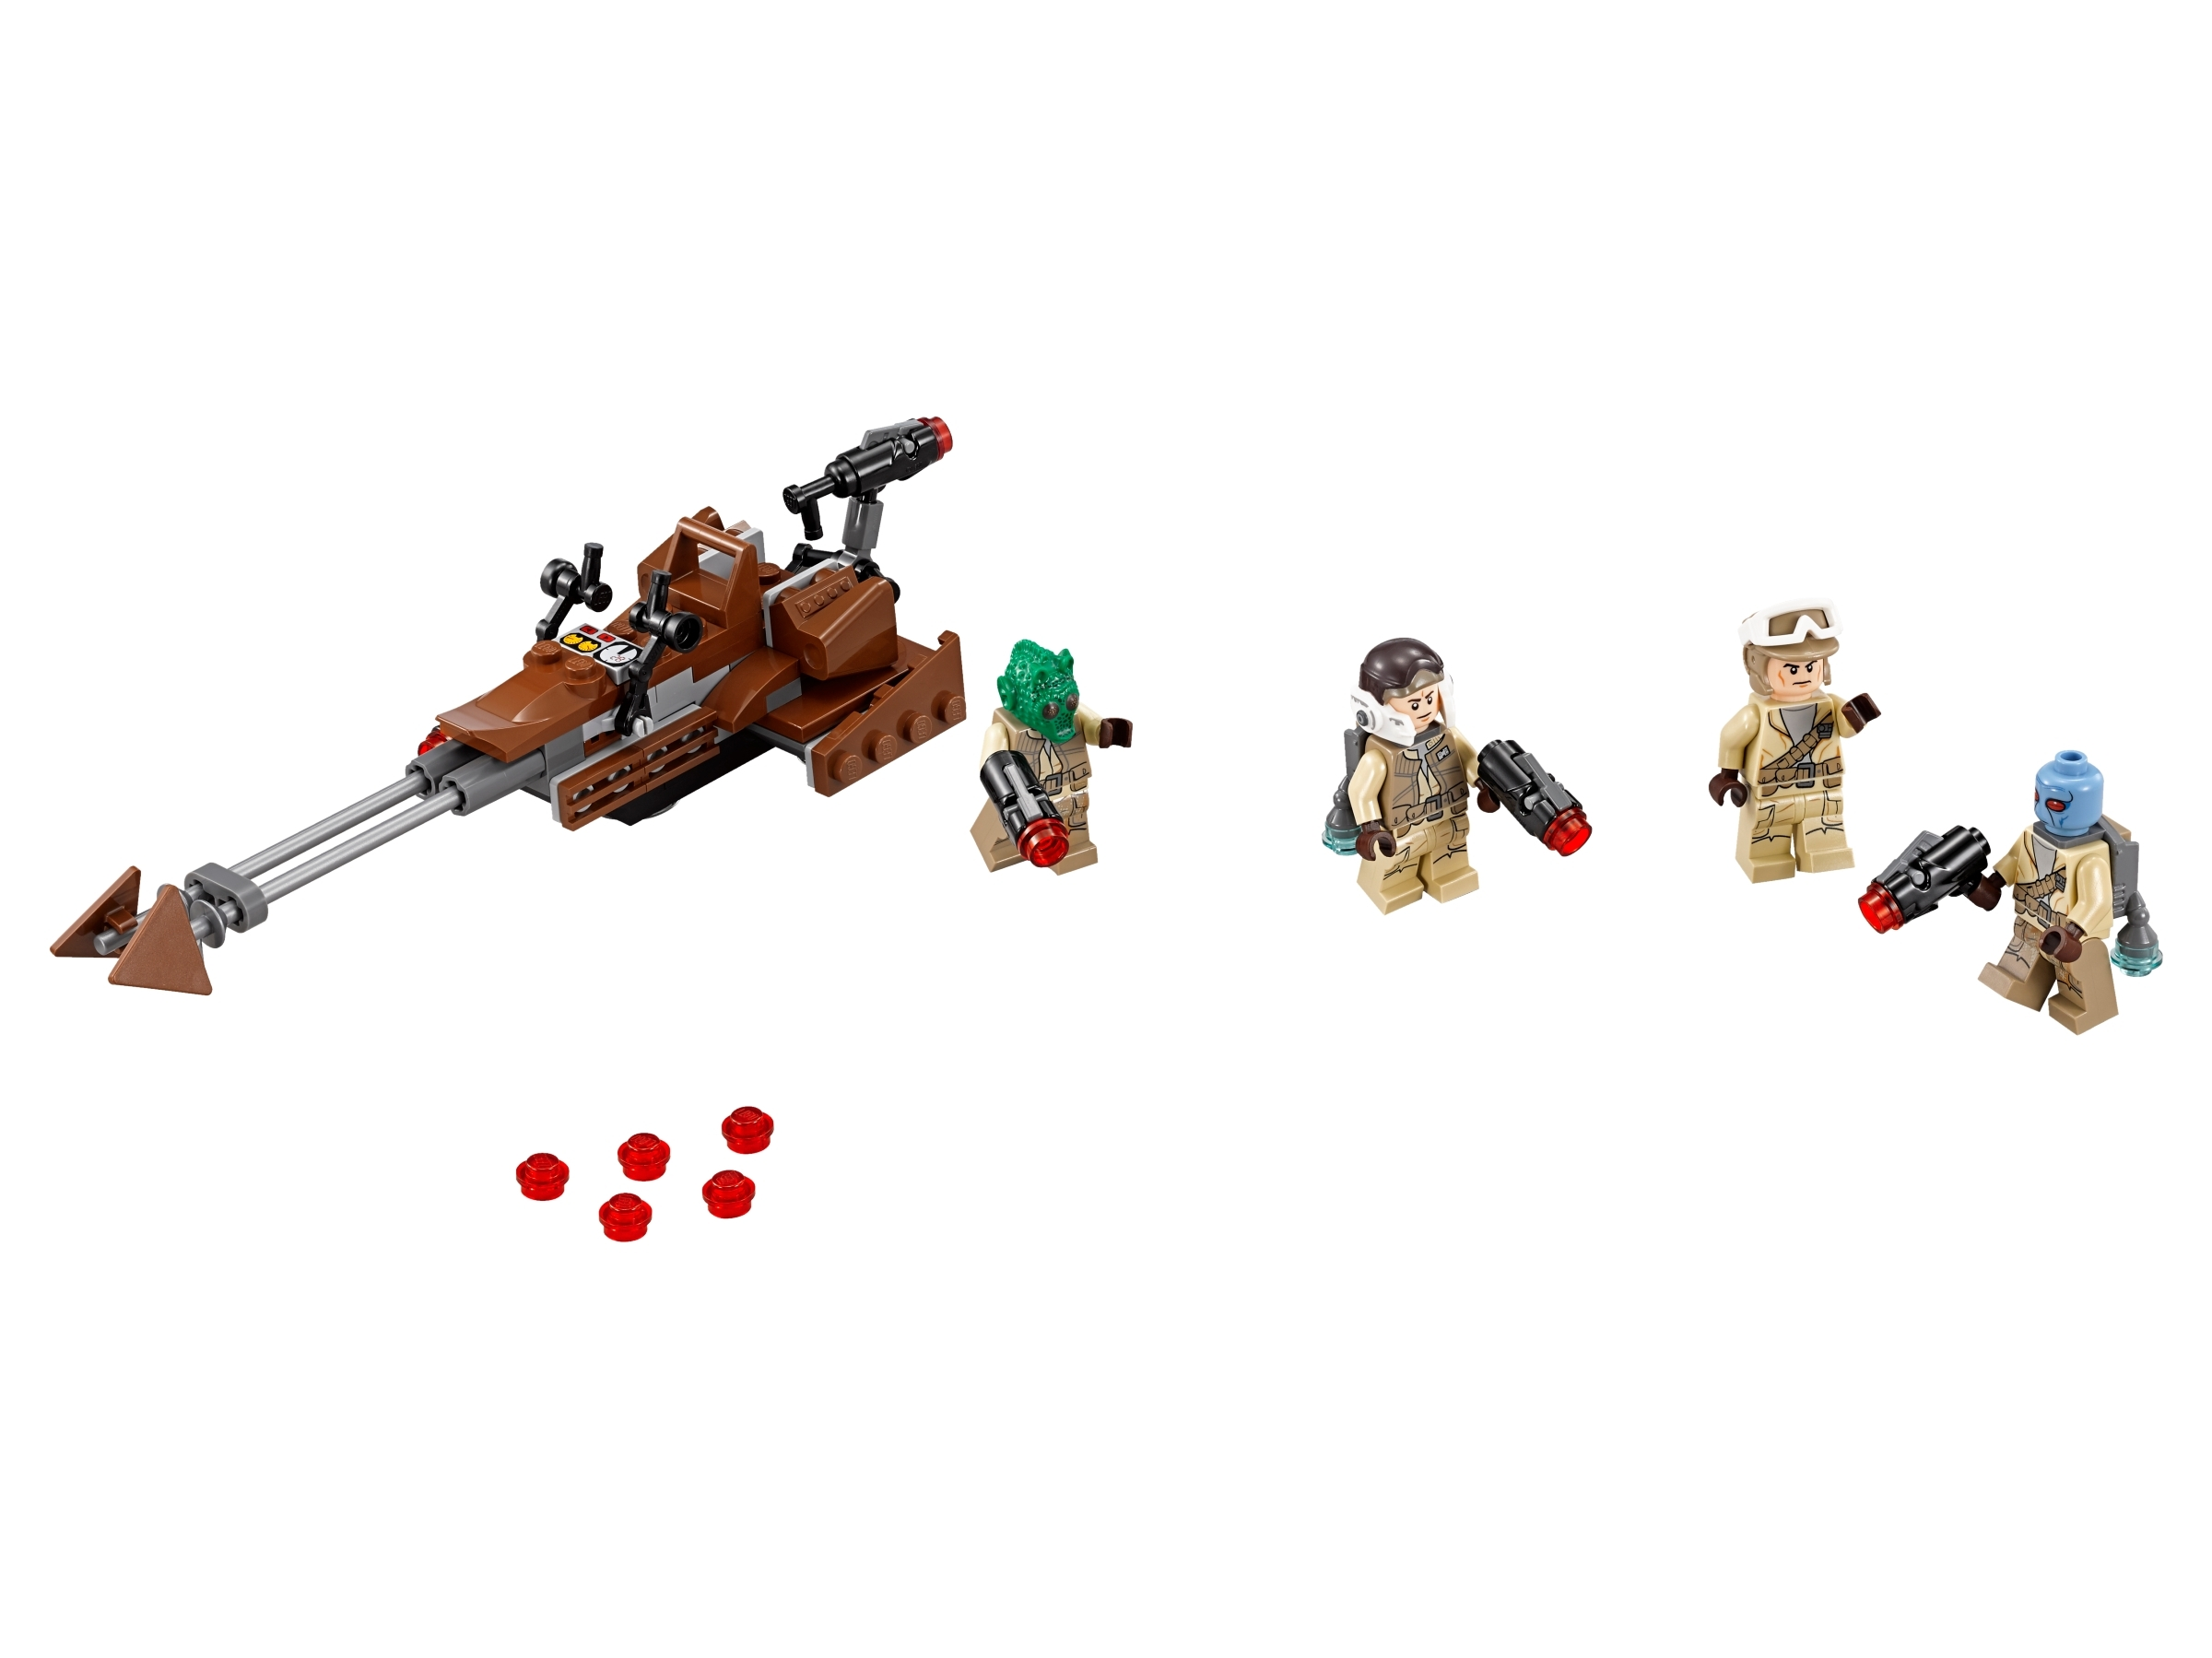 LEGO® Star Wars™ Rebel Alliance Custom Trooper rouge one minifigure blaster tan